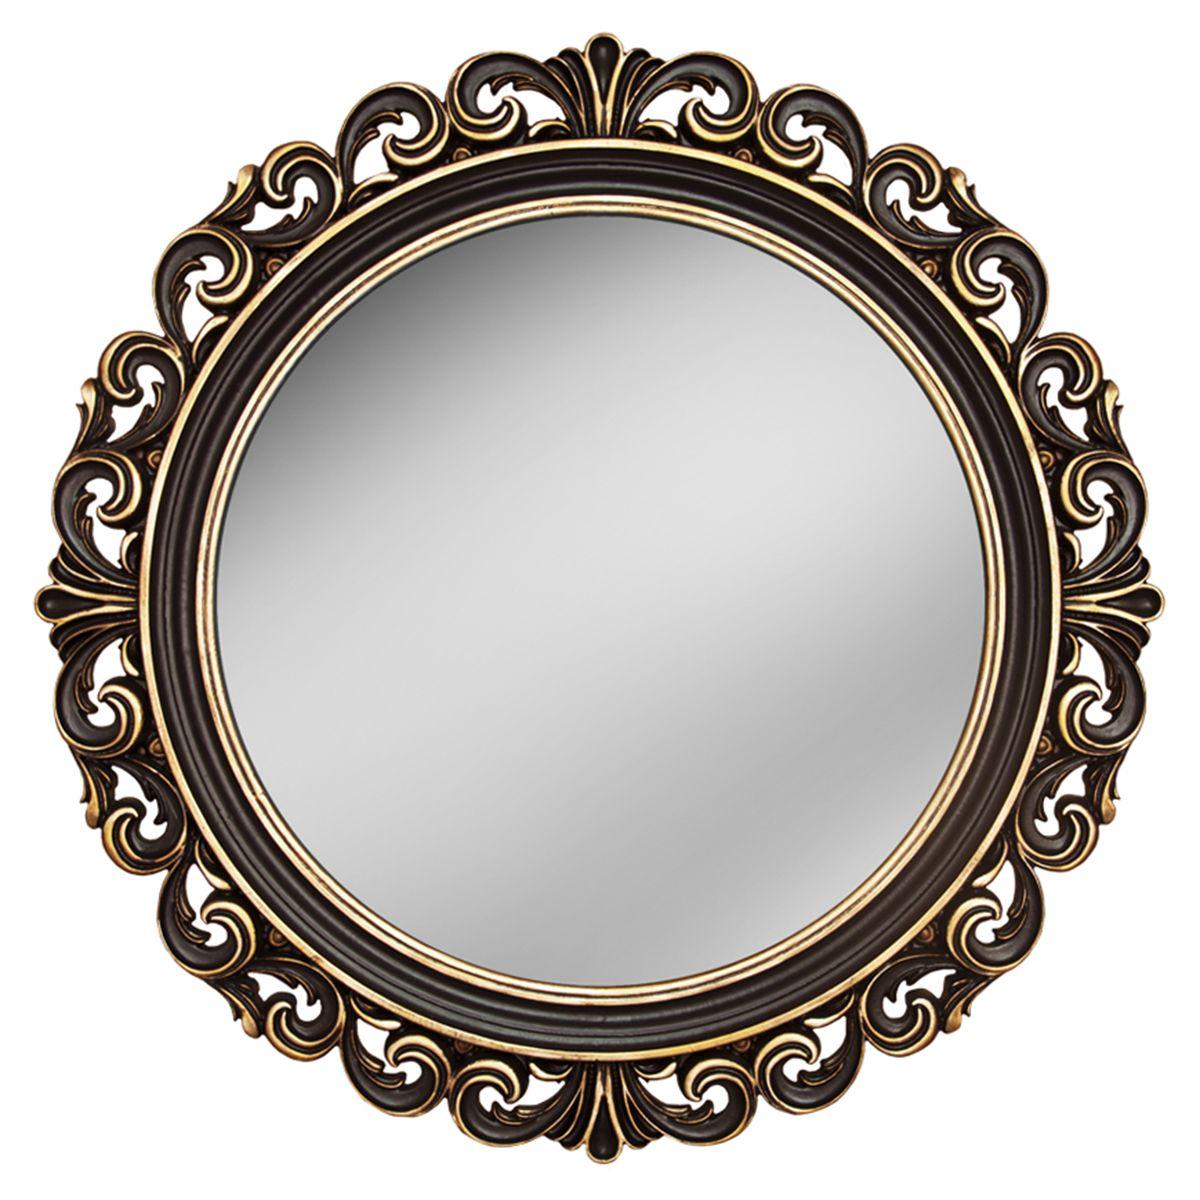 Зеркало VezzoLLi Рикиоли, цвет: коричневый, диаметр 90 см17-05